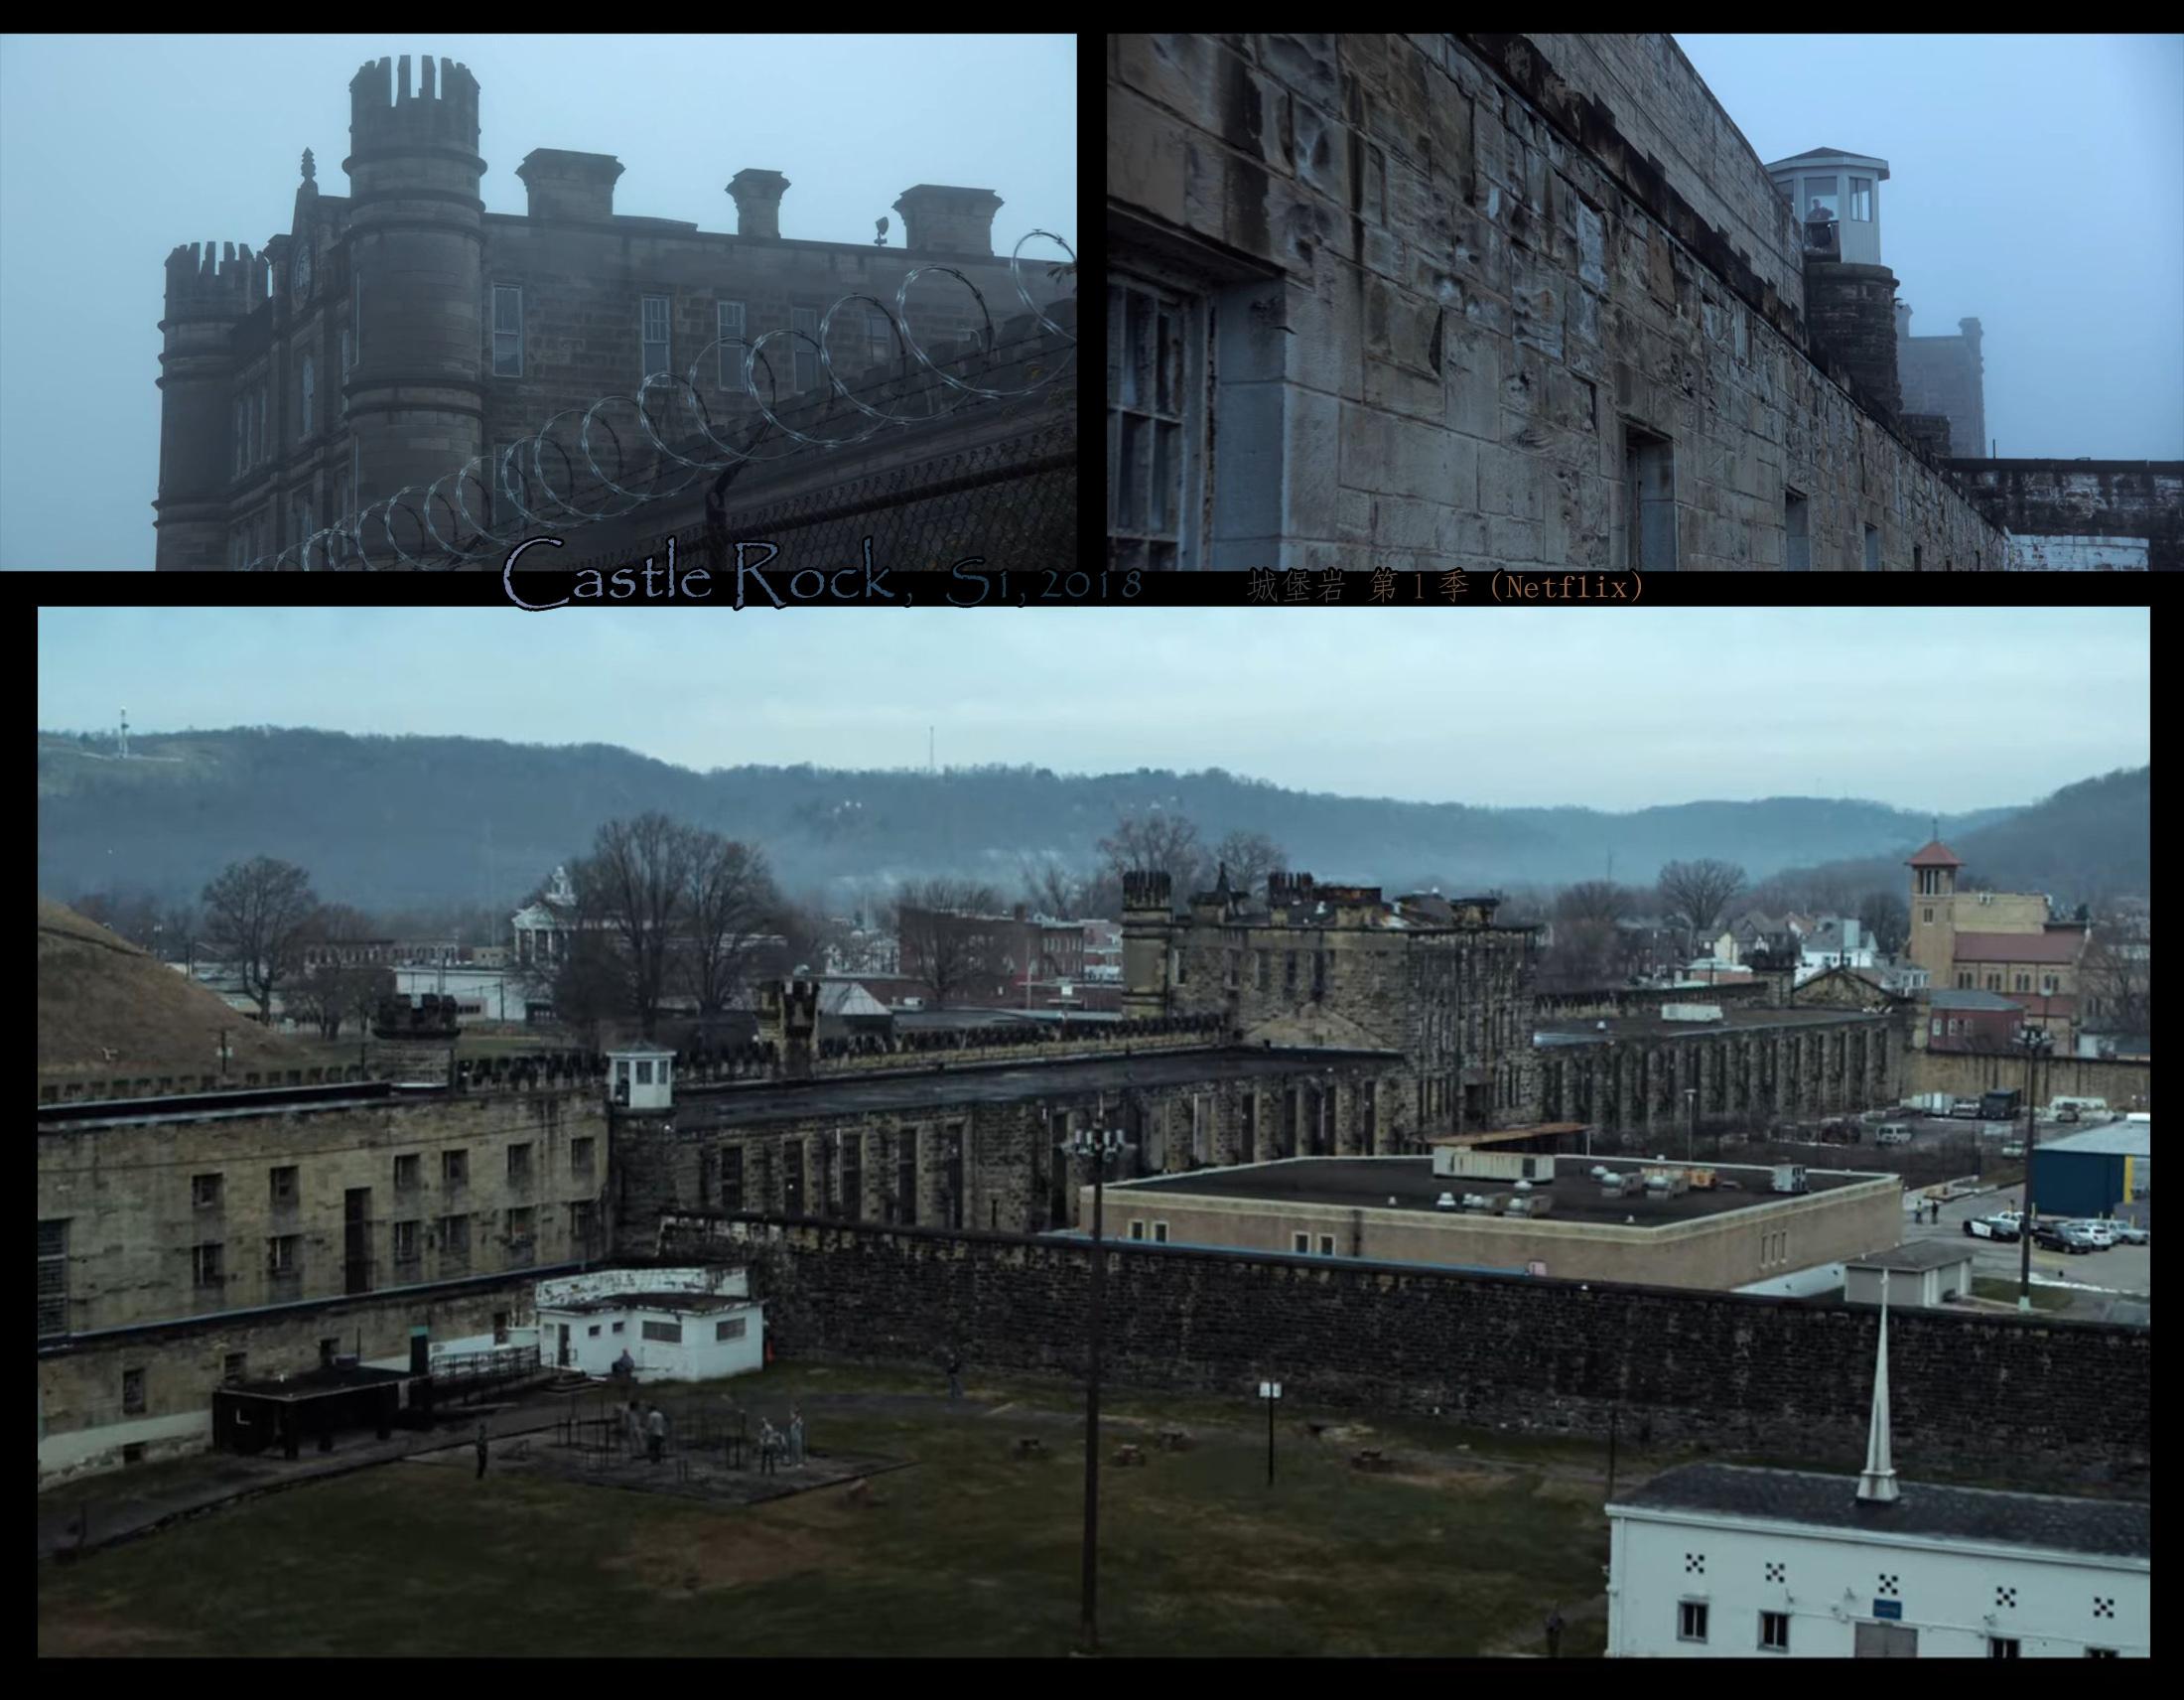 Castle Rock S1 (2018) 城堡岩 第1季 (Netflix) -00.jpg